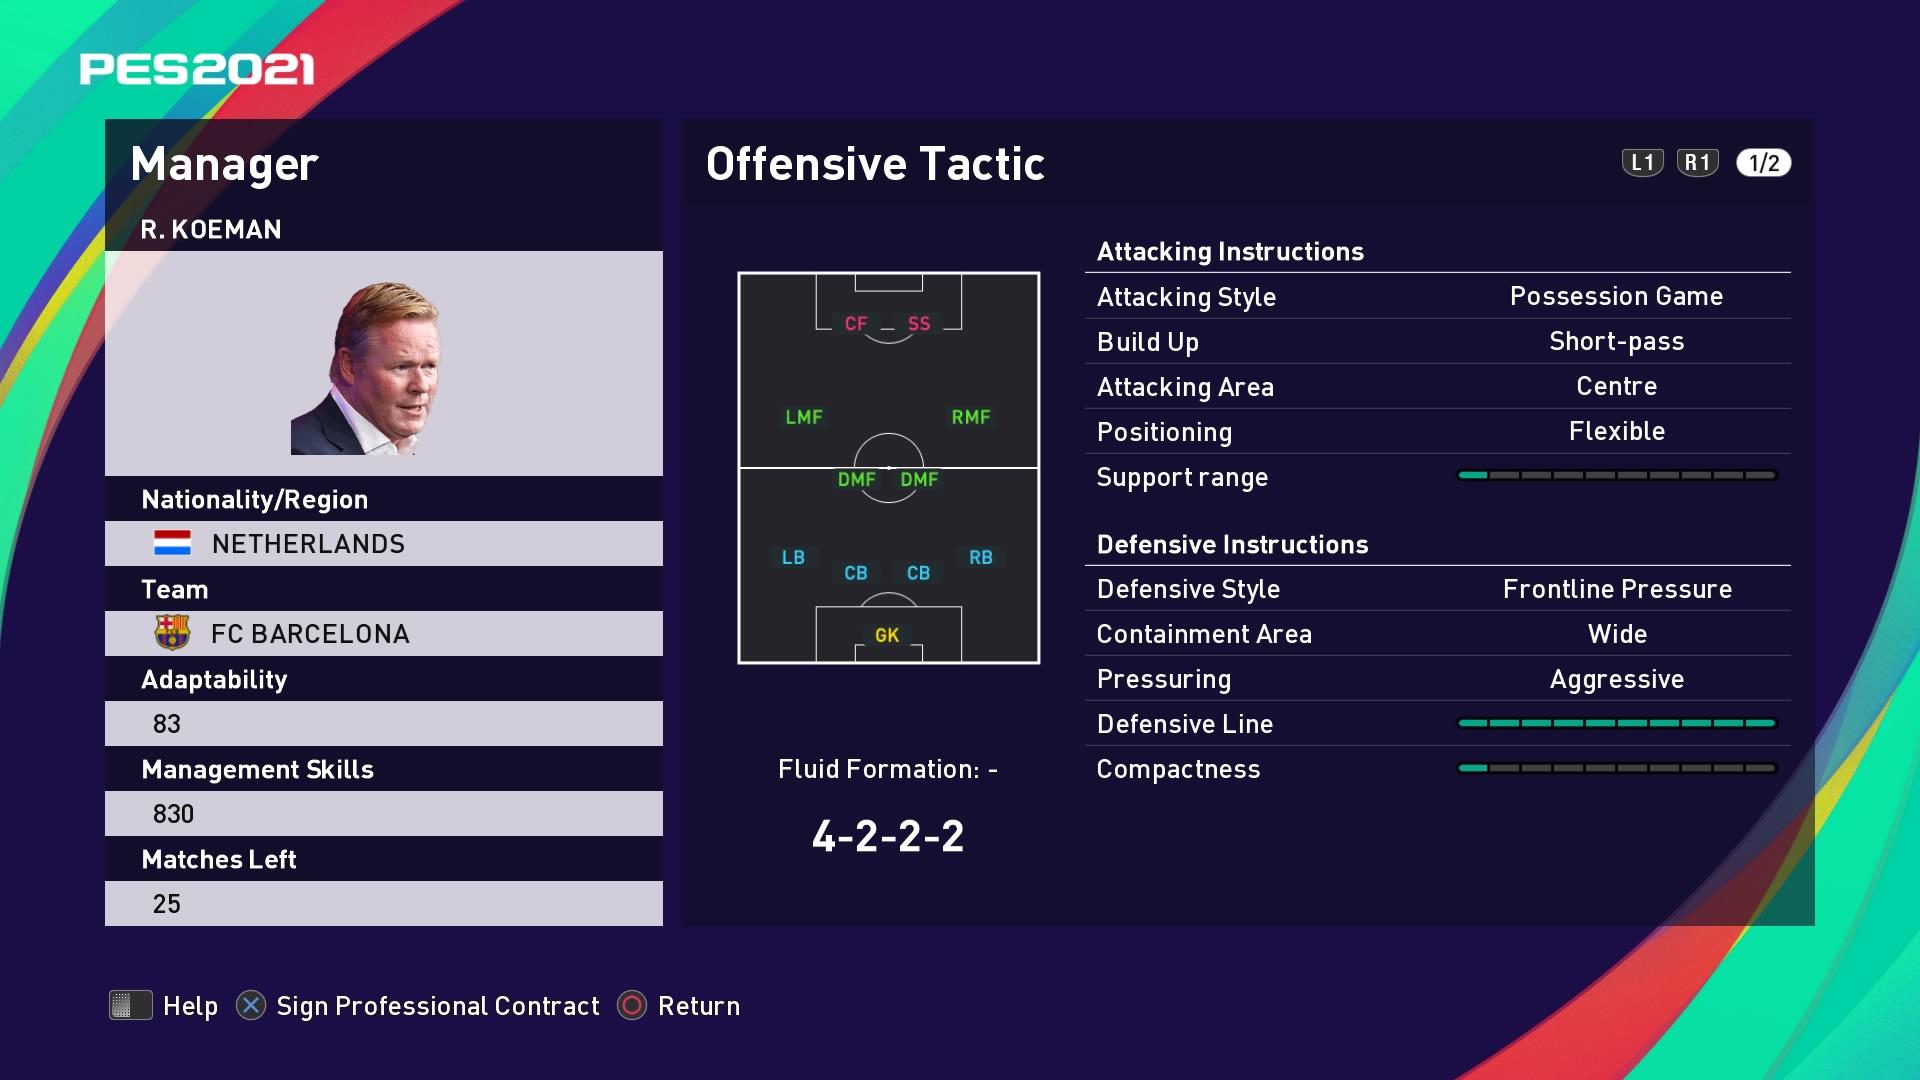 R. Koeman (2) (Ronald Koeman) Offensive Tactic in PES 2021 myClub